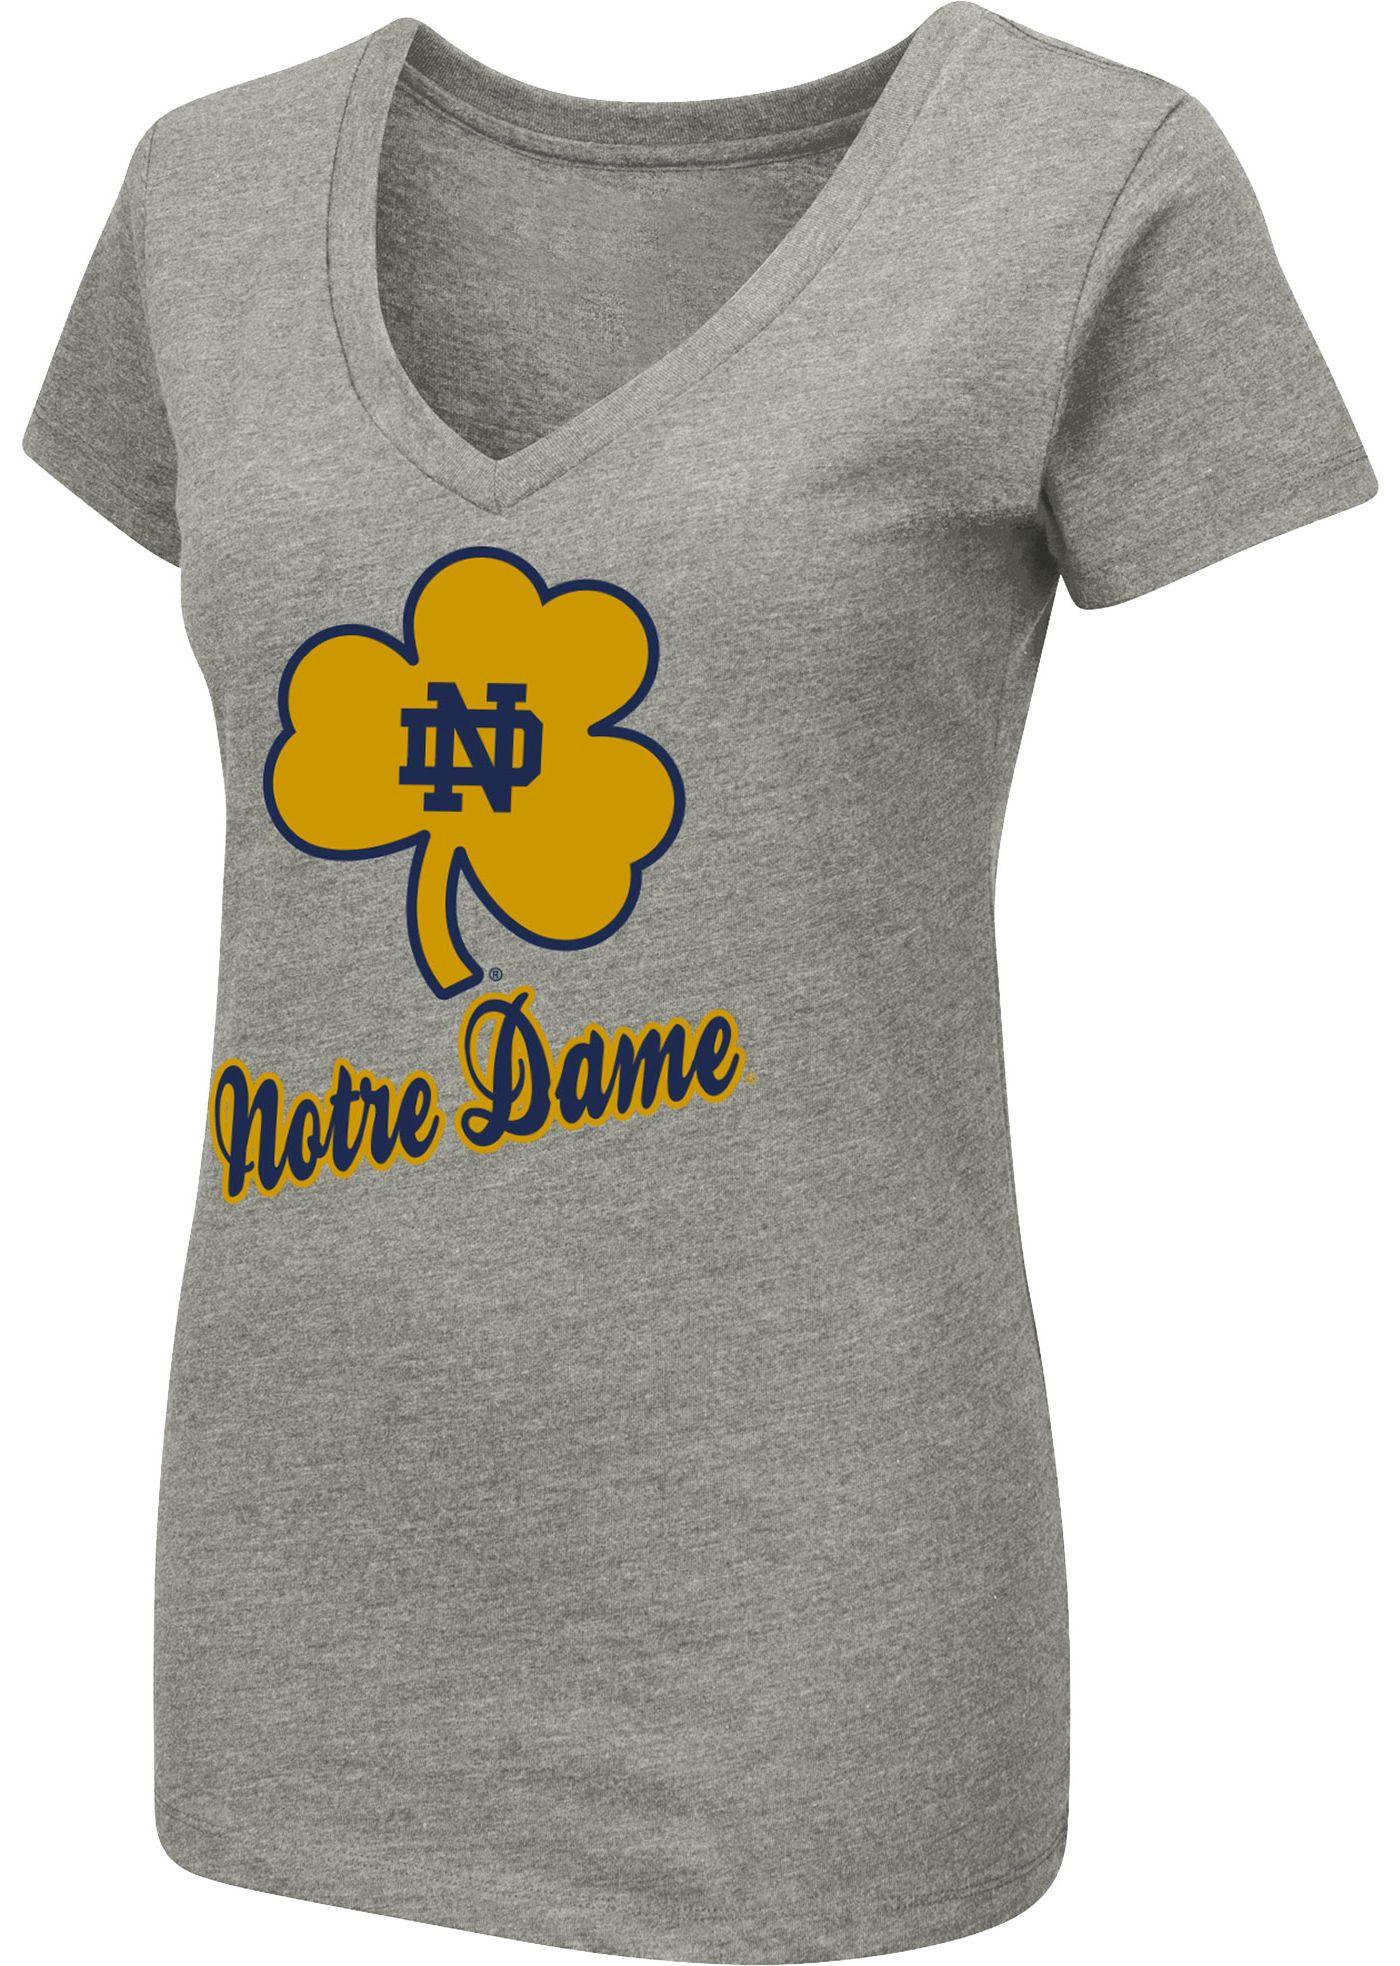 Colosseum Women's Notre Dame Fighting Irish Grey Dual Blend V-Neck T-Shirt